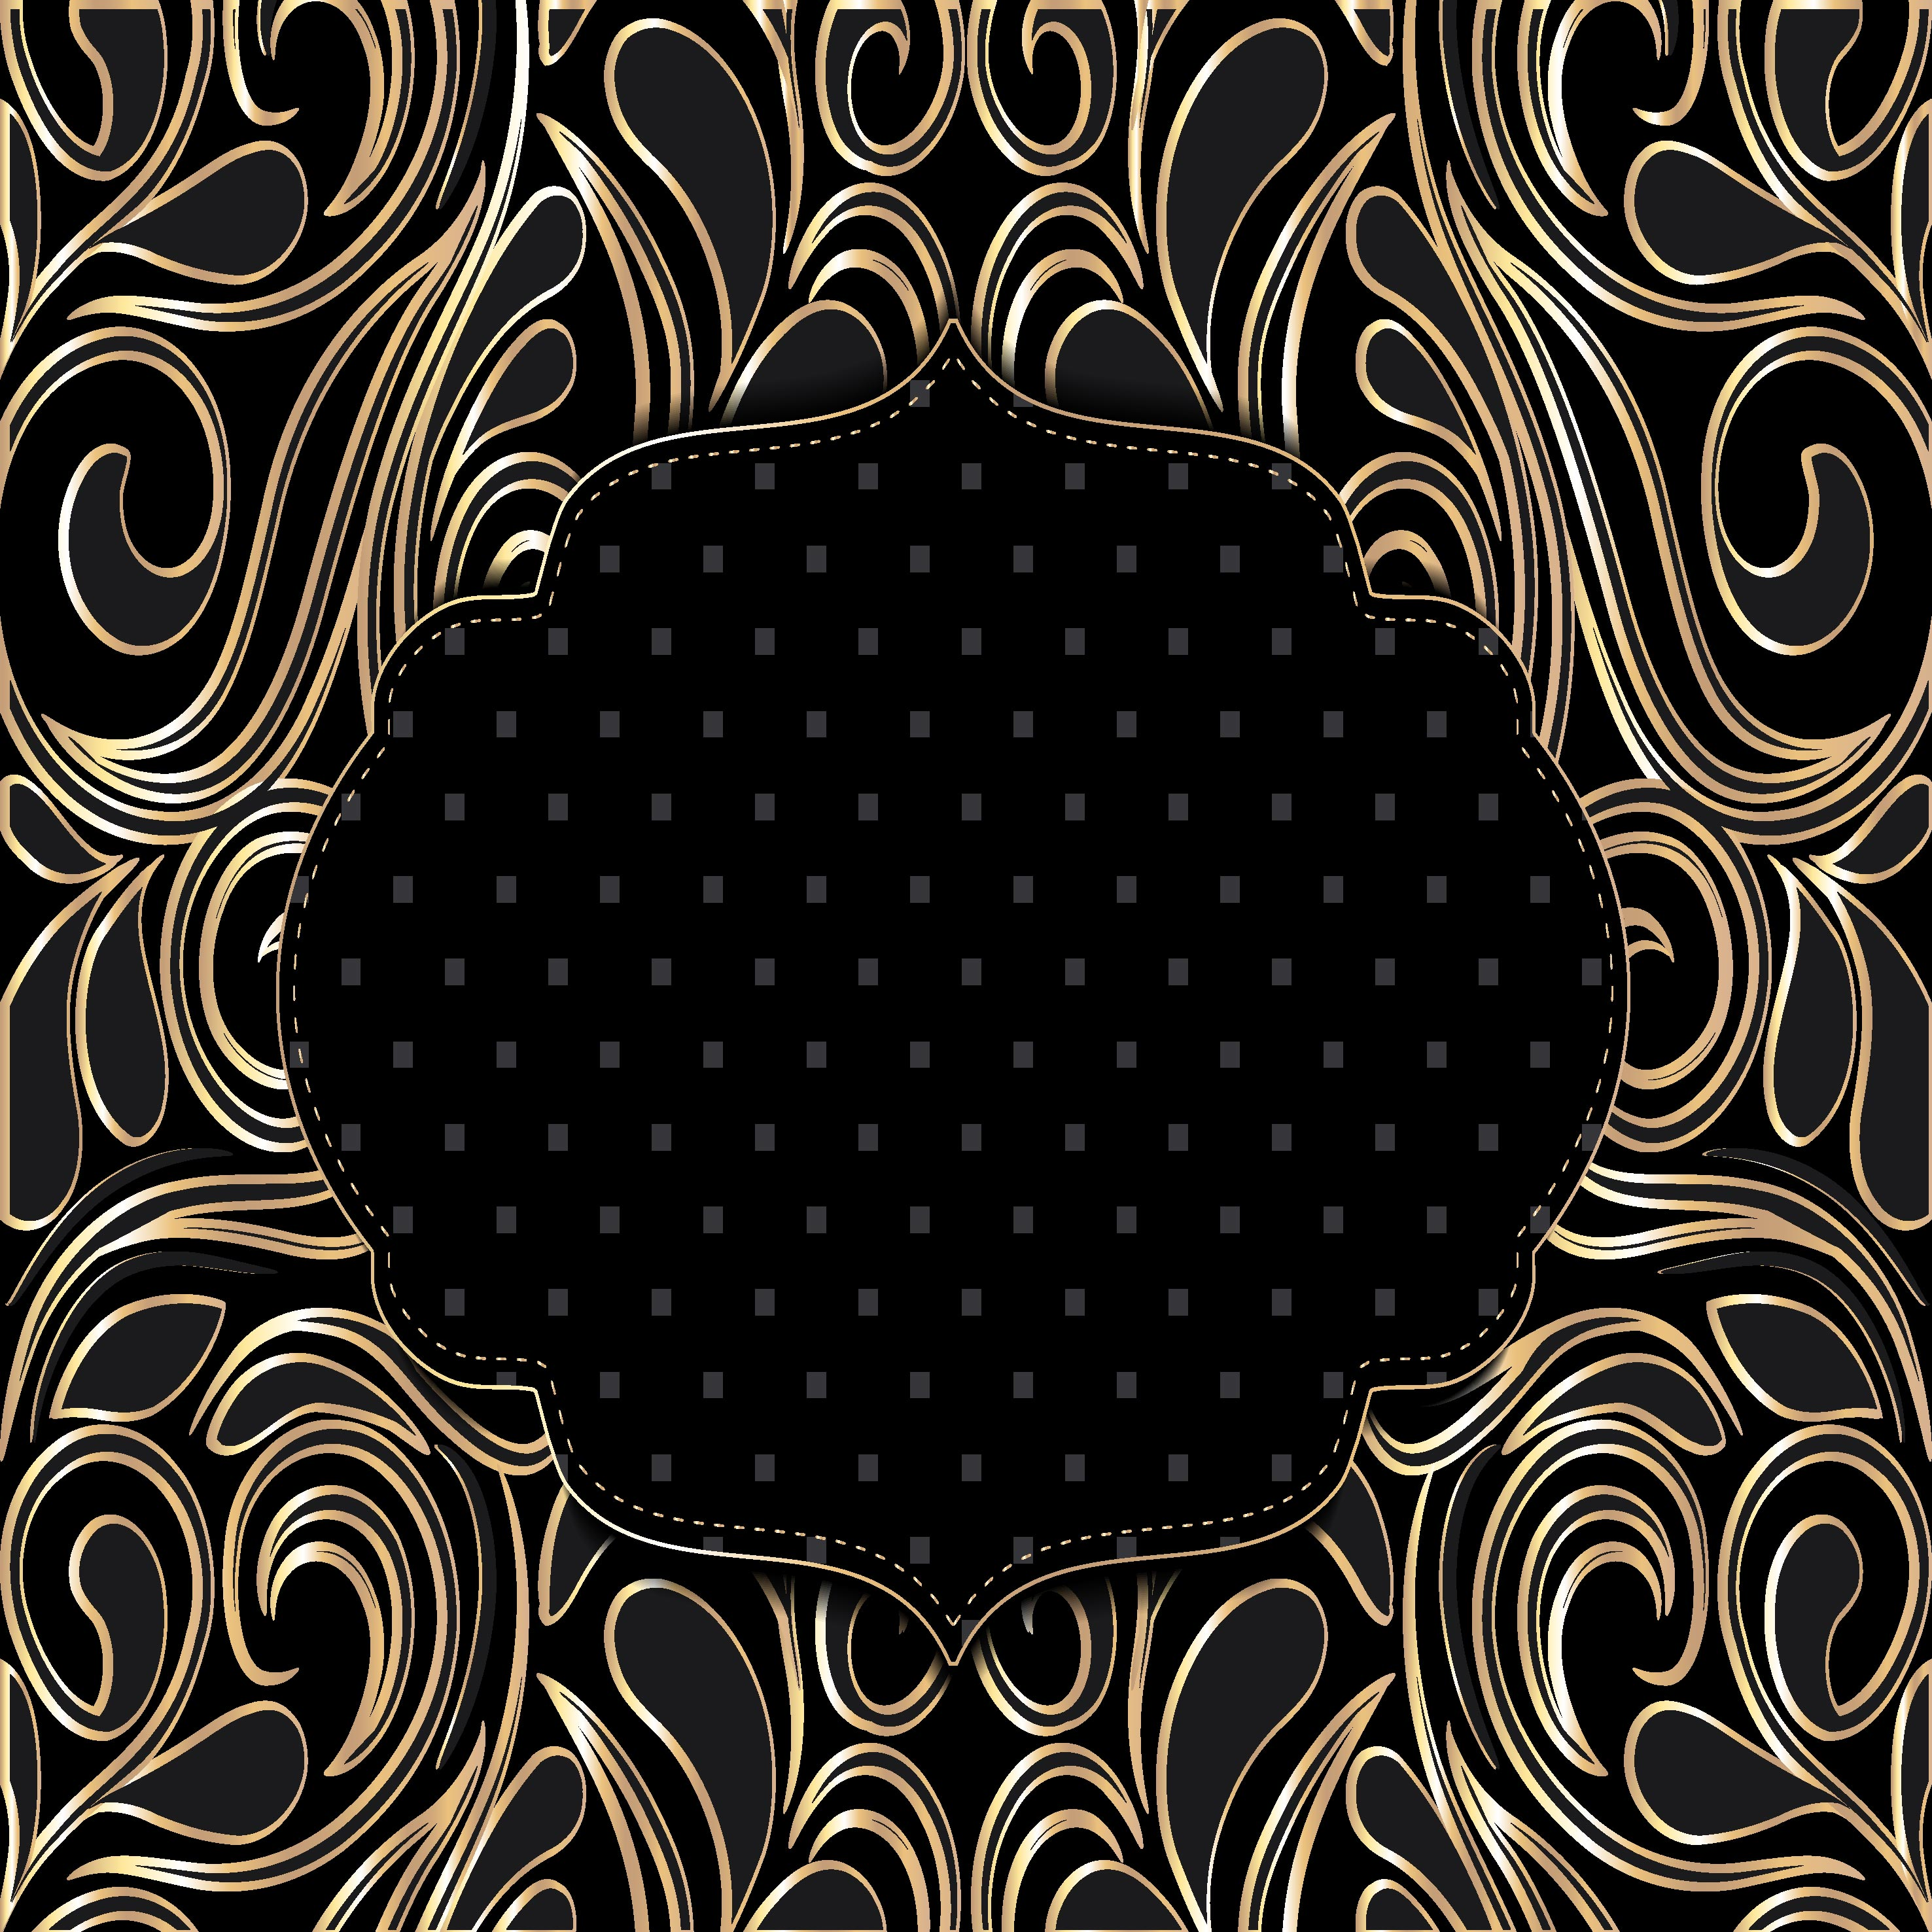 floral pattern design wallpaper background  decorative